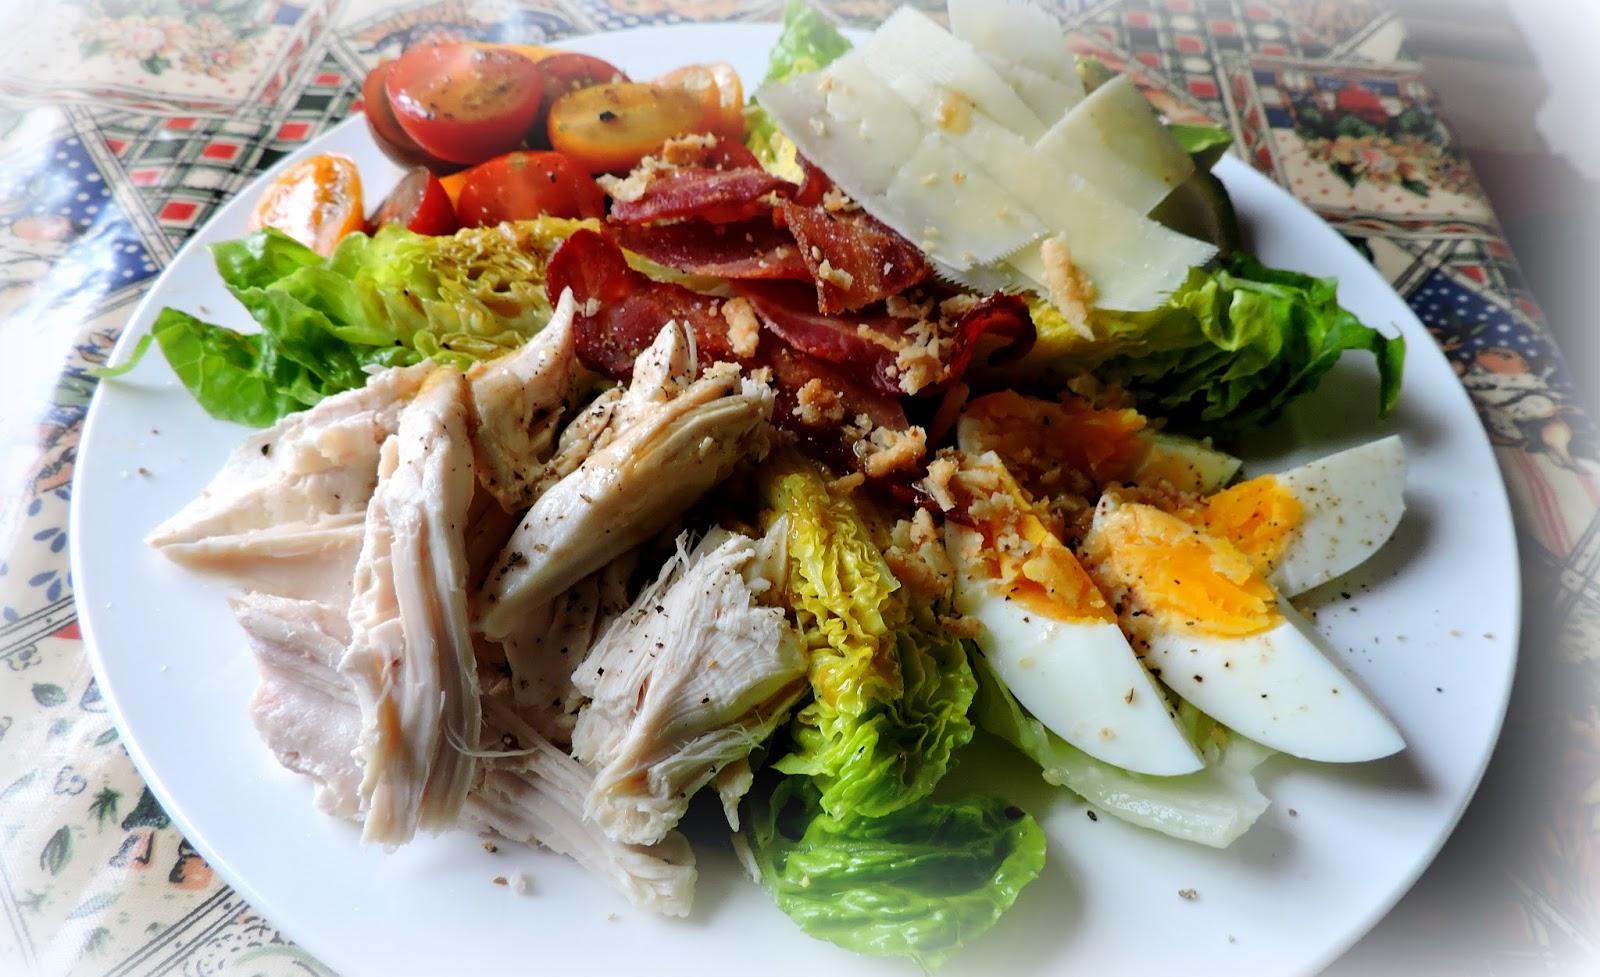 The English Kitchen: Classic Cobb Salad